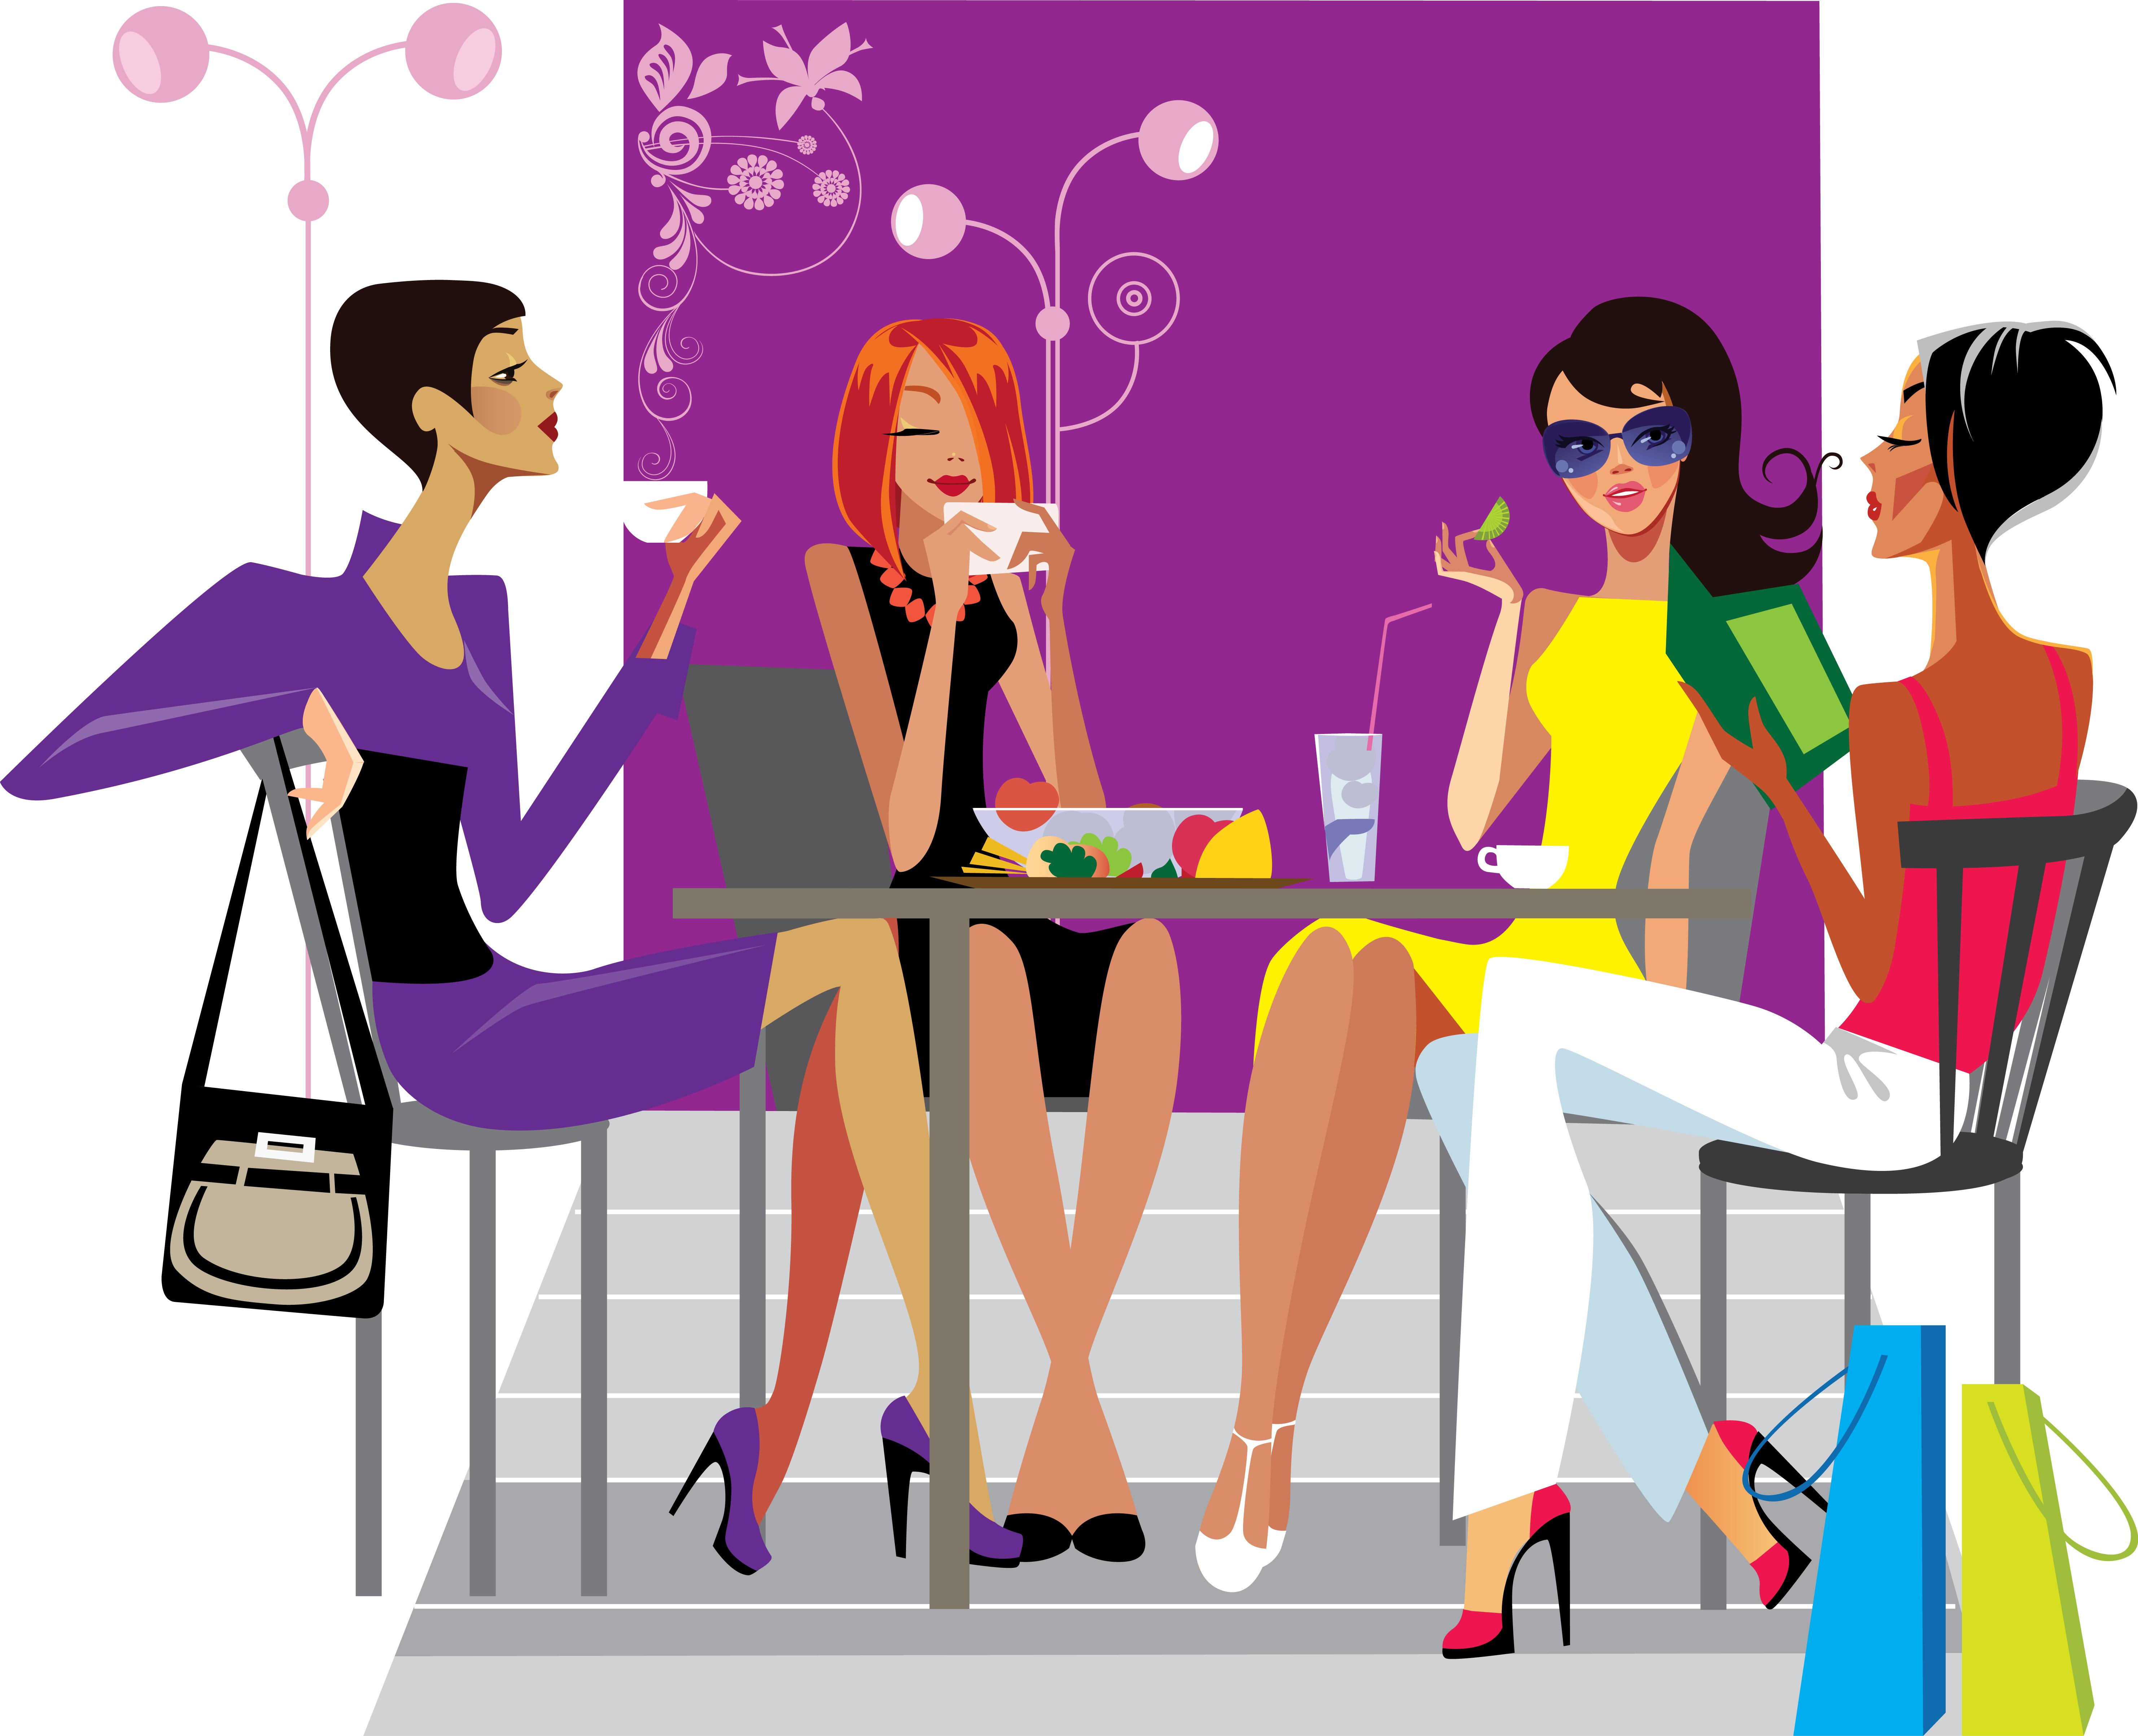 Meeting clipart group woman Women Free Free Art Guelph